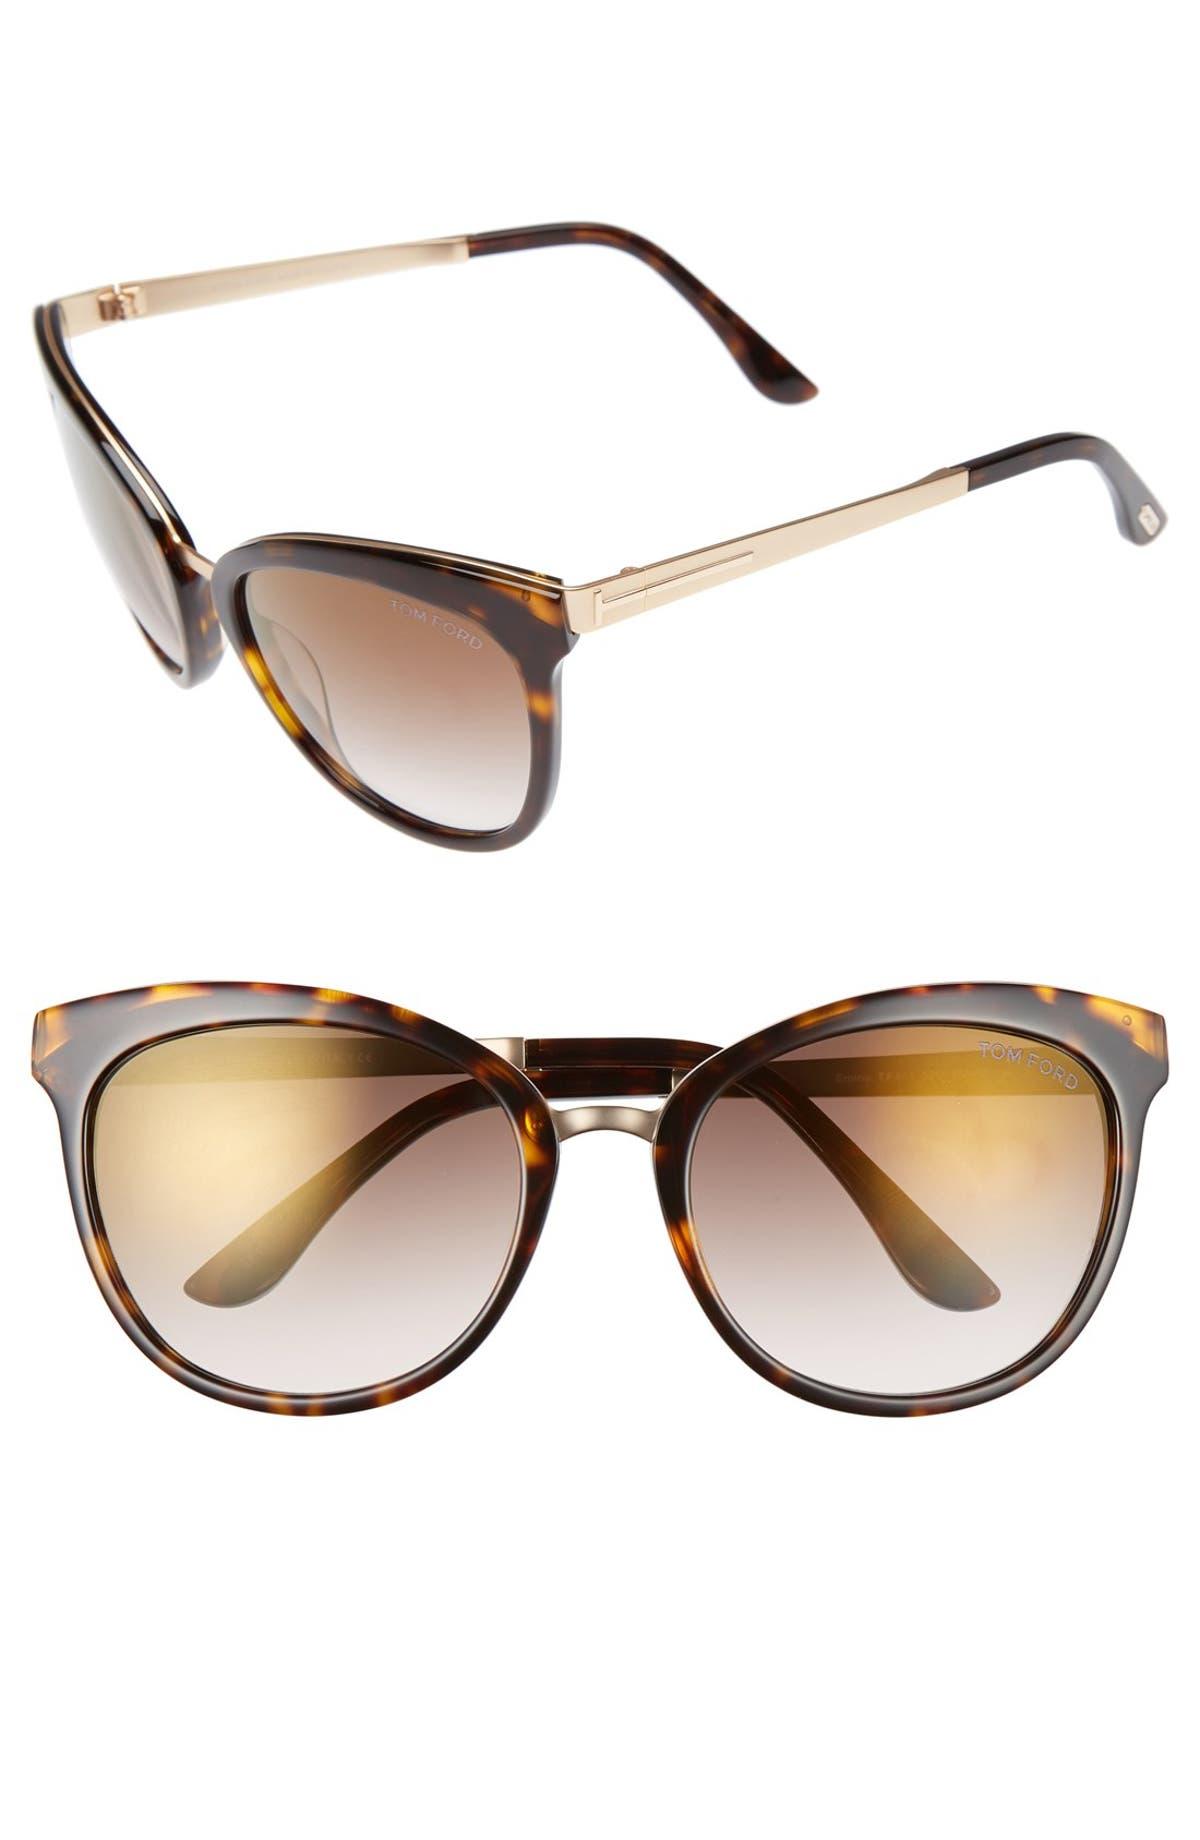 265730bb5d Tom Ford  Emma  56mm Retro Sunglasses